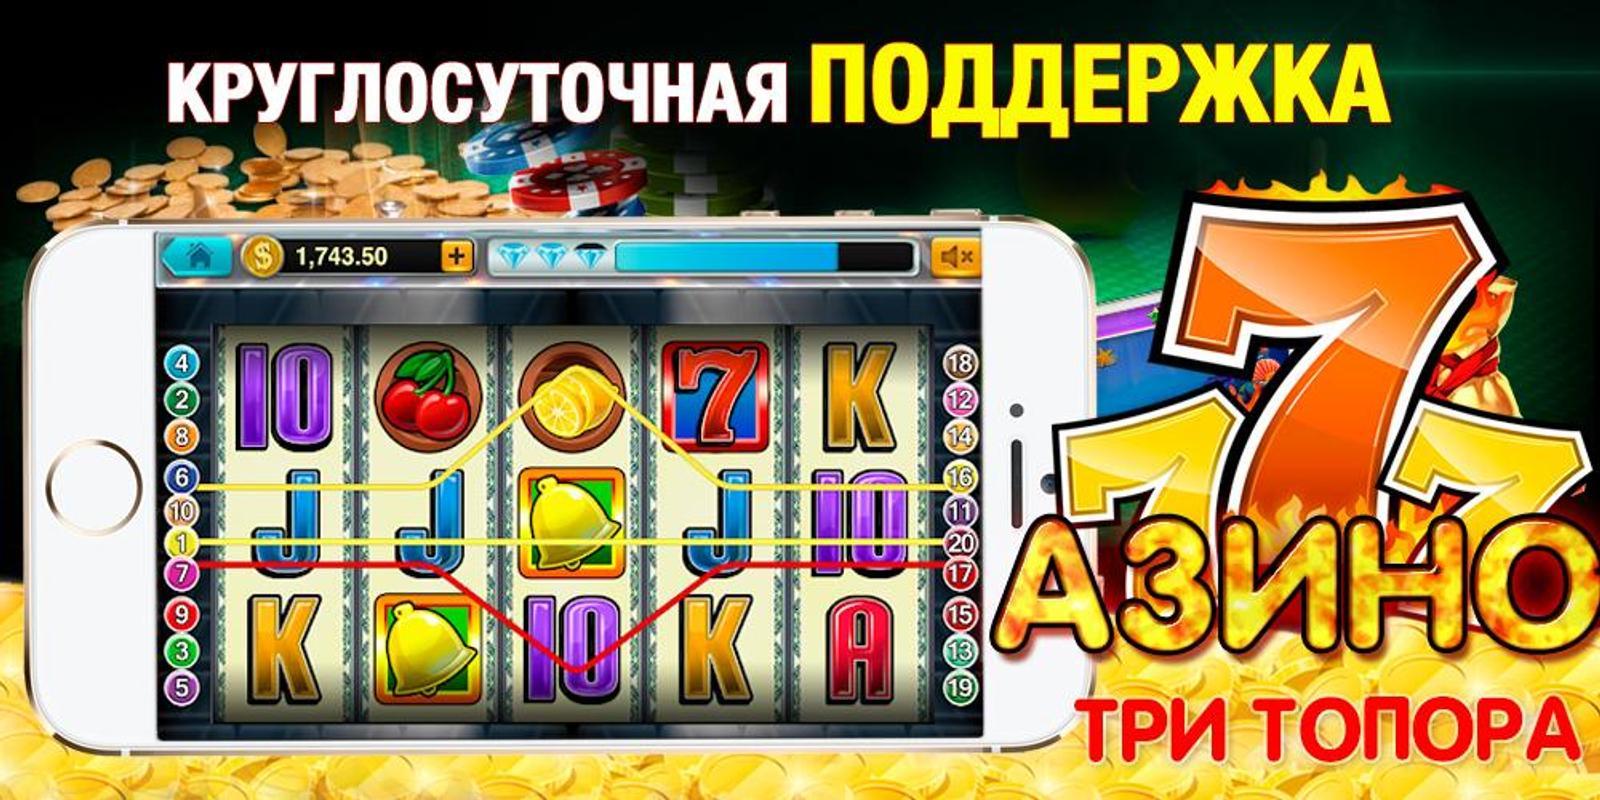 онлайн казино азино777 отзывы